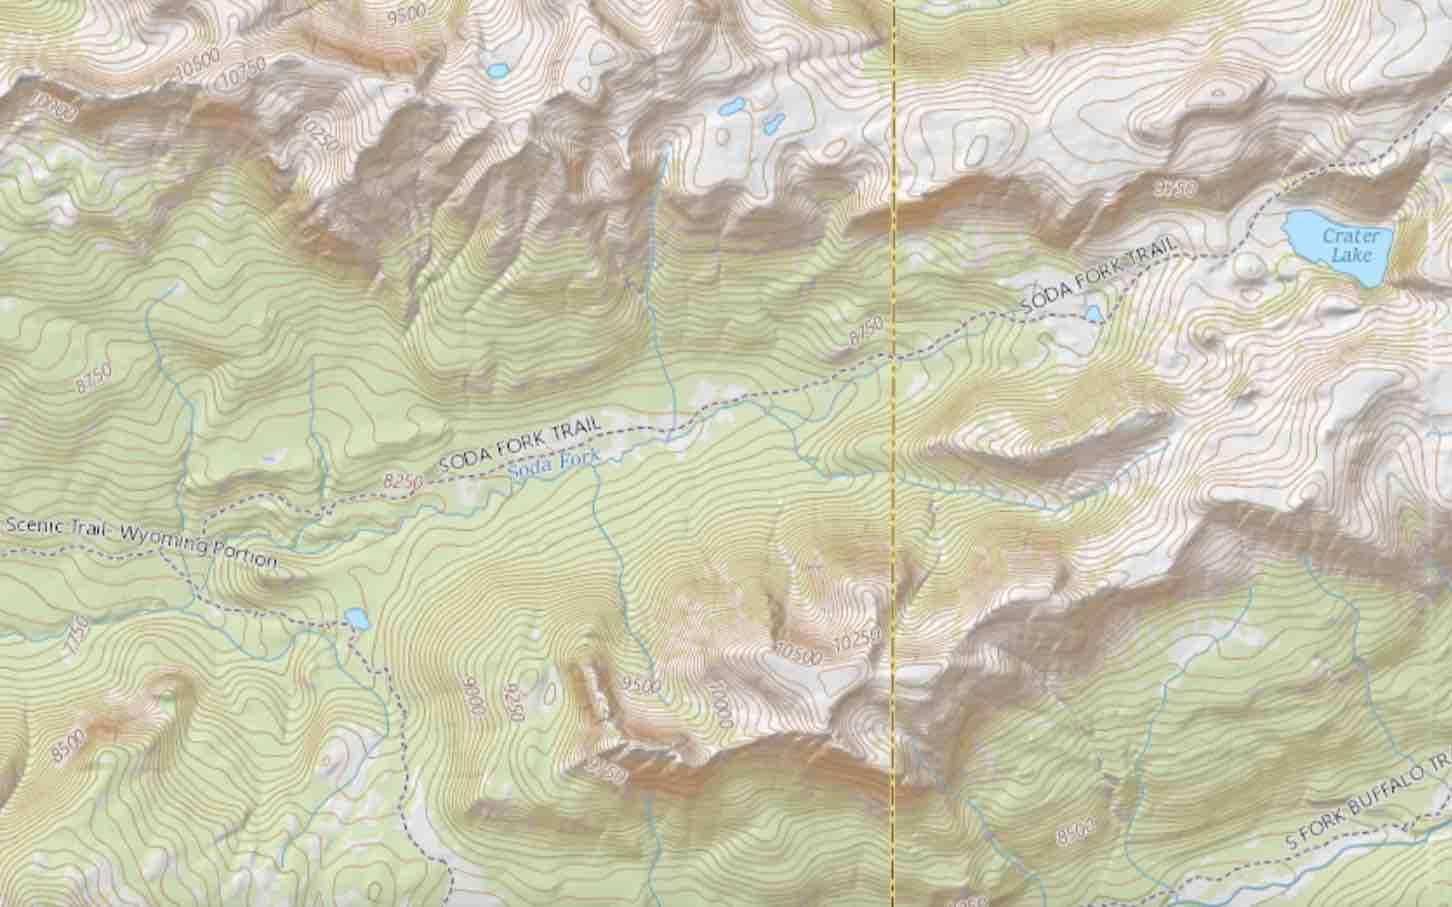 Soda Fork Mountain Hunting Camp